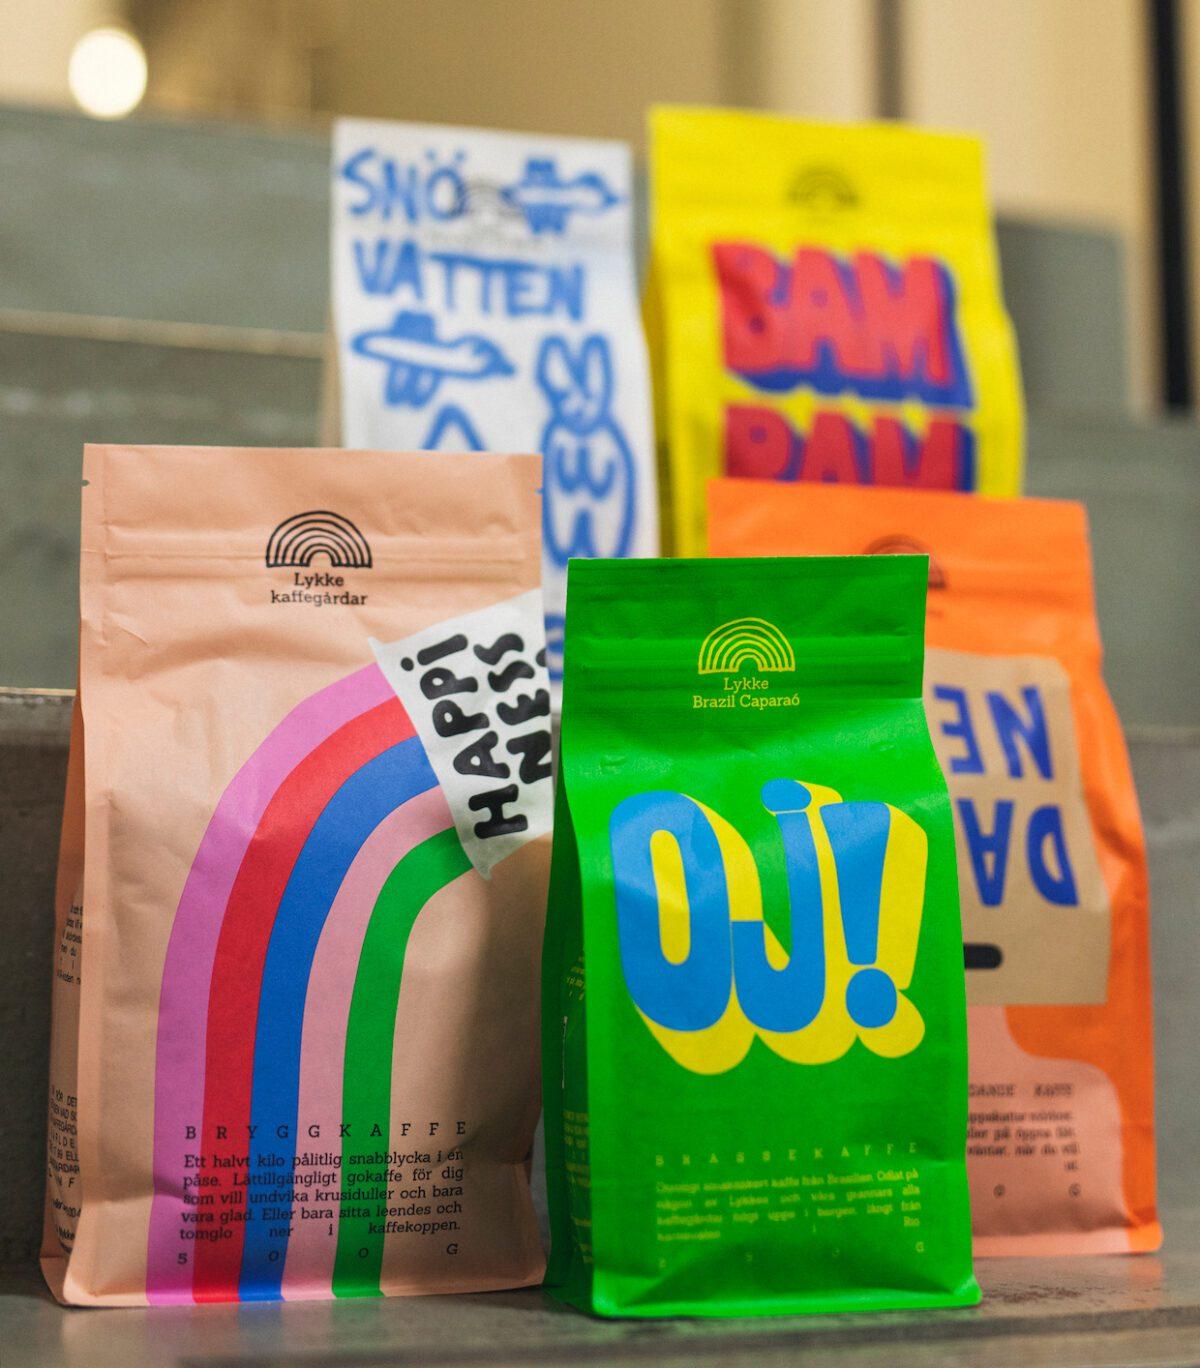 Lykke Kaffegårdar, coffee types in branded coffee bags.